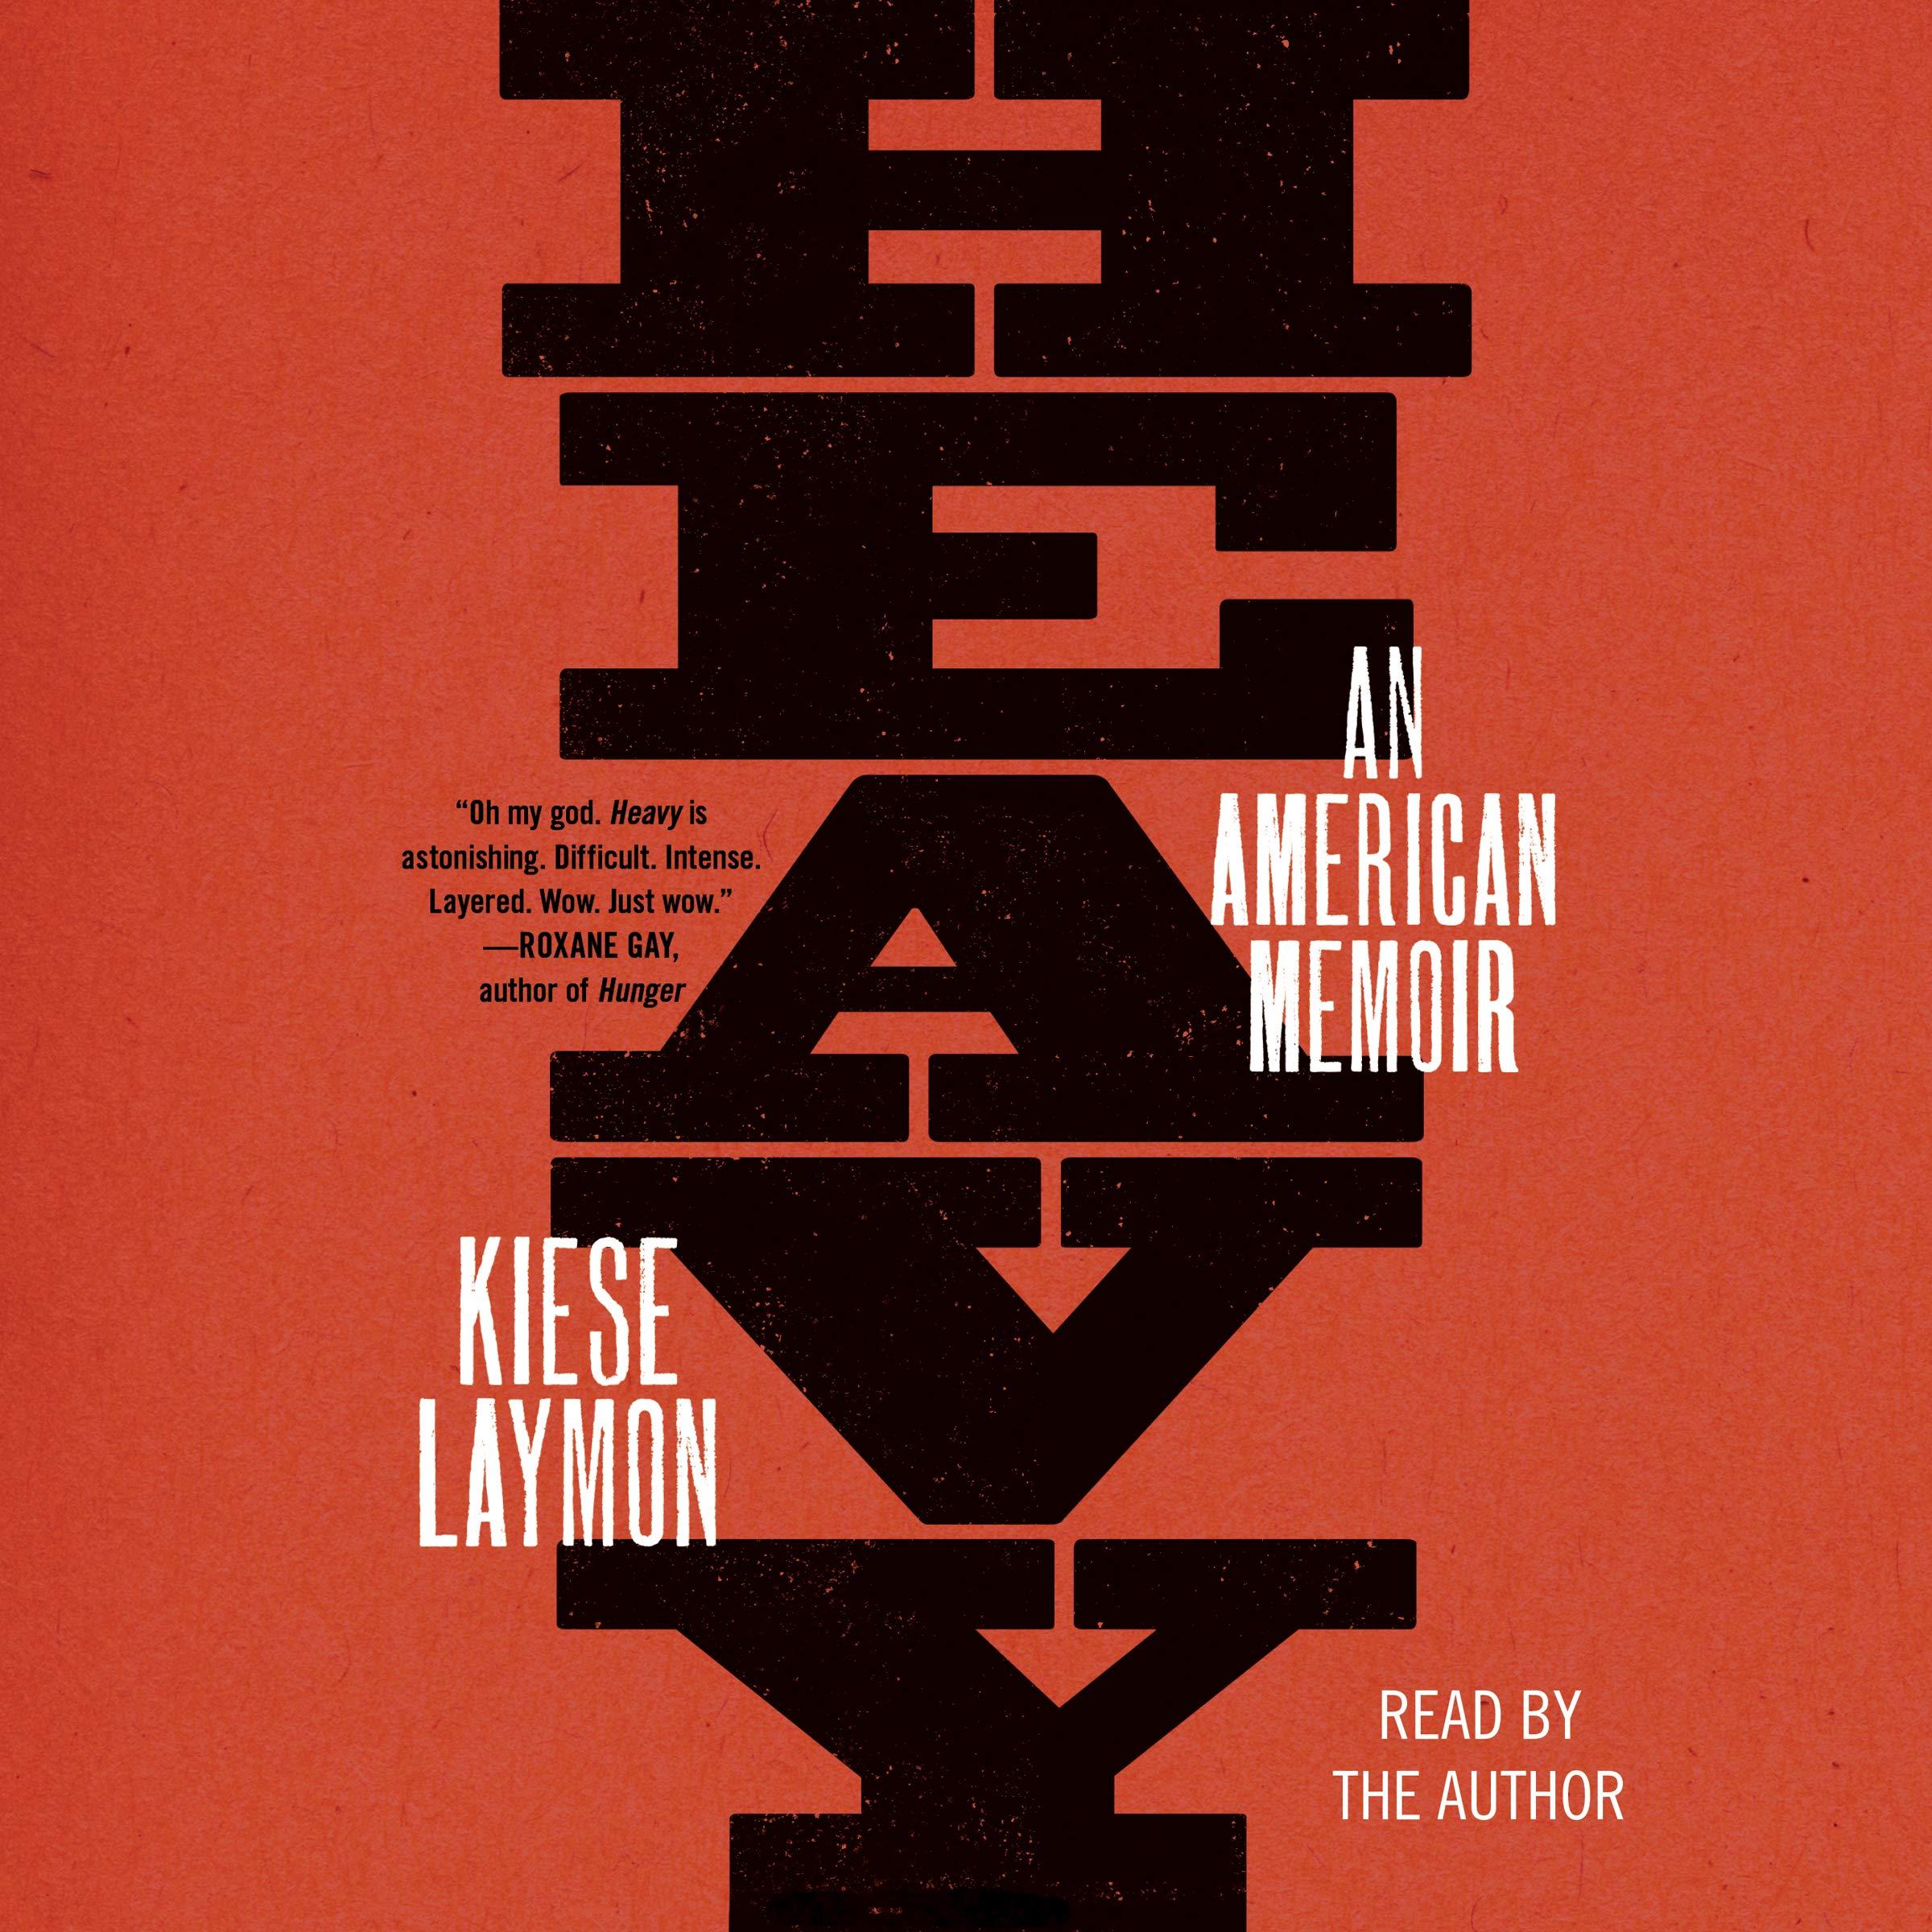 Amazon.com: Heavy (Audible Audio Edition): Kiese Laymon, Kiese ...